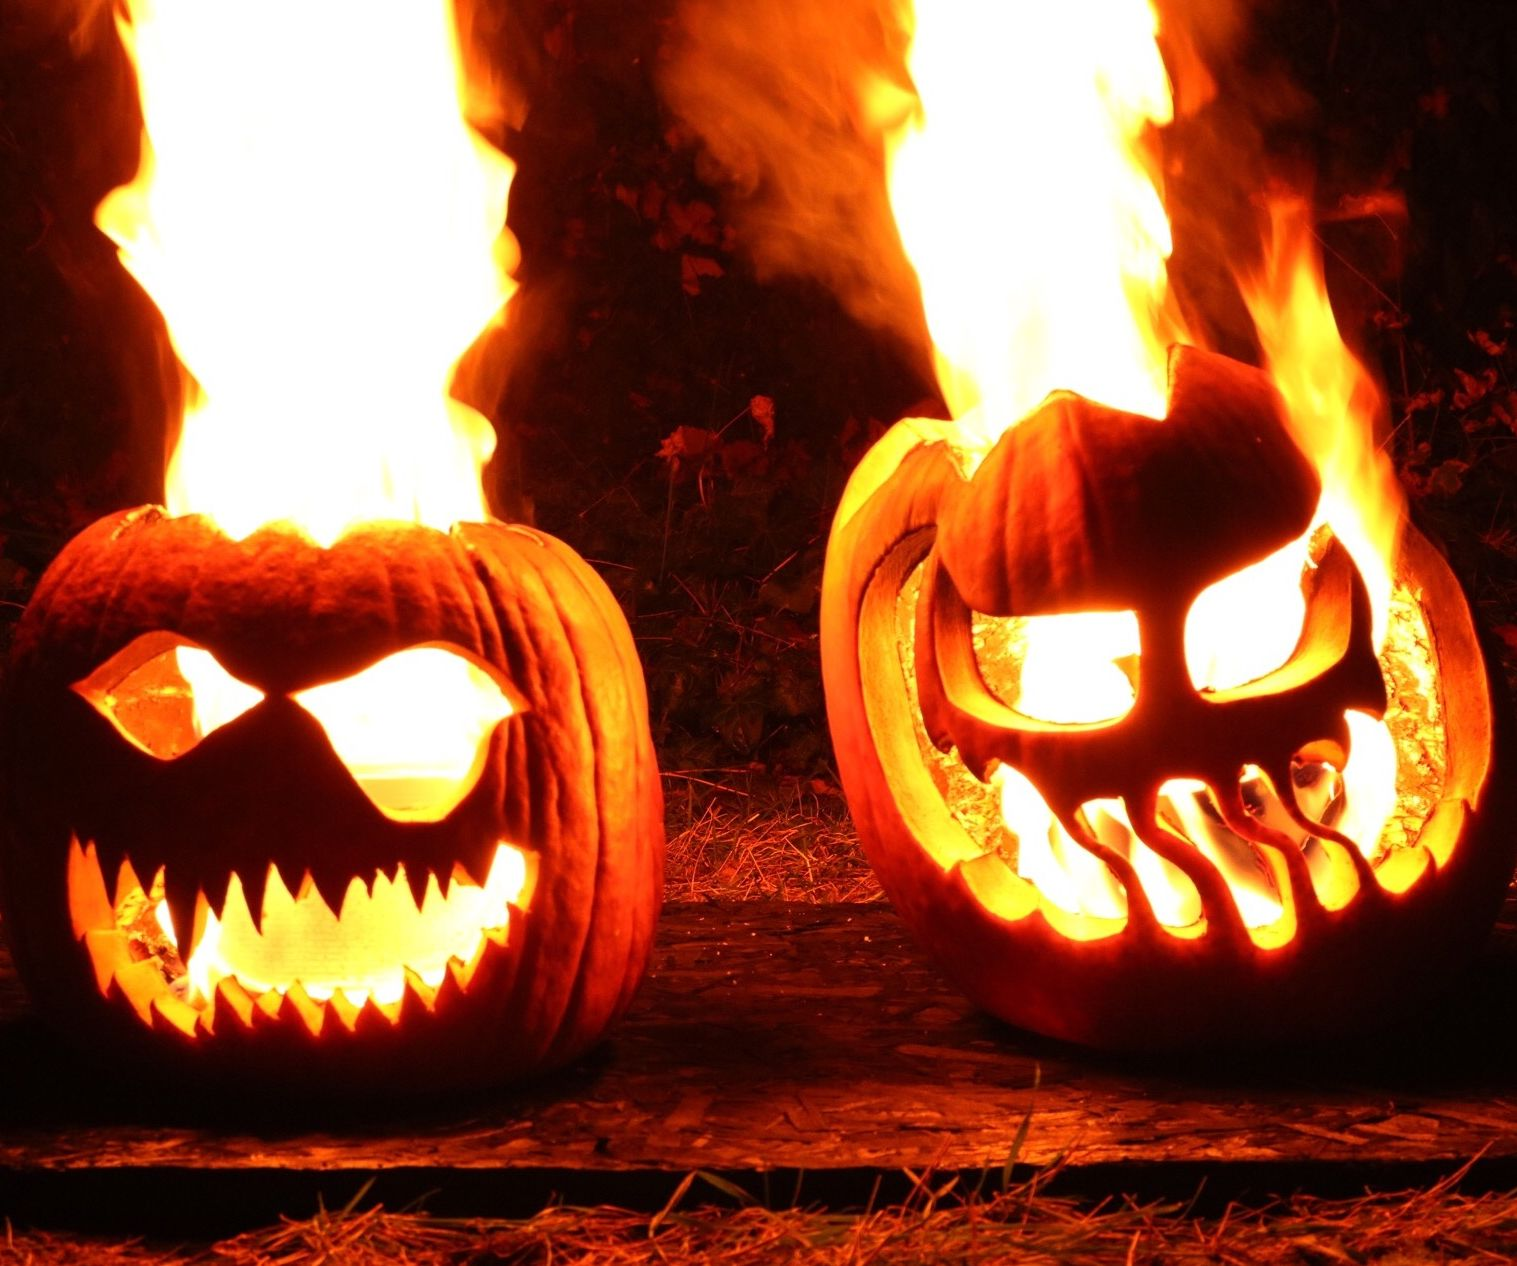 Flaming Halloween Jack O Lanterns 6 Steps With